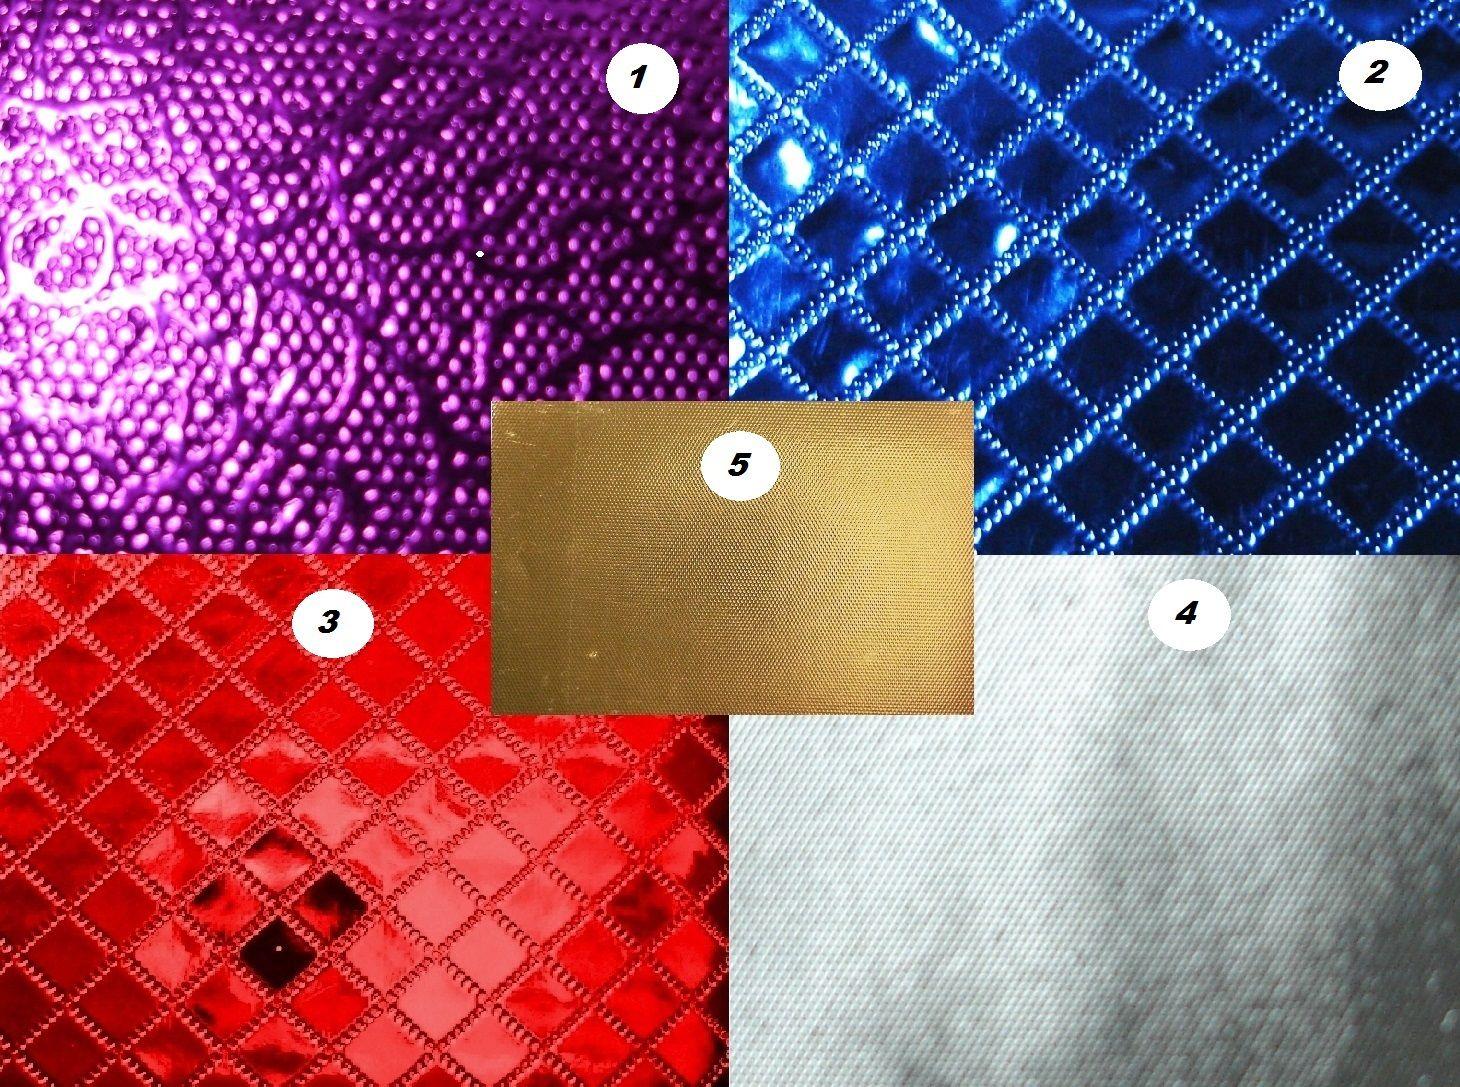 5 designs alu metall optik selbstklebefolie klebefolie for Klebefolie metall